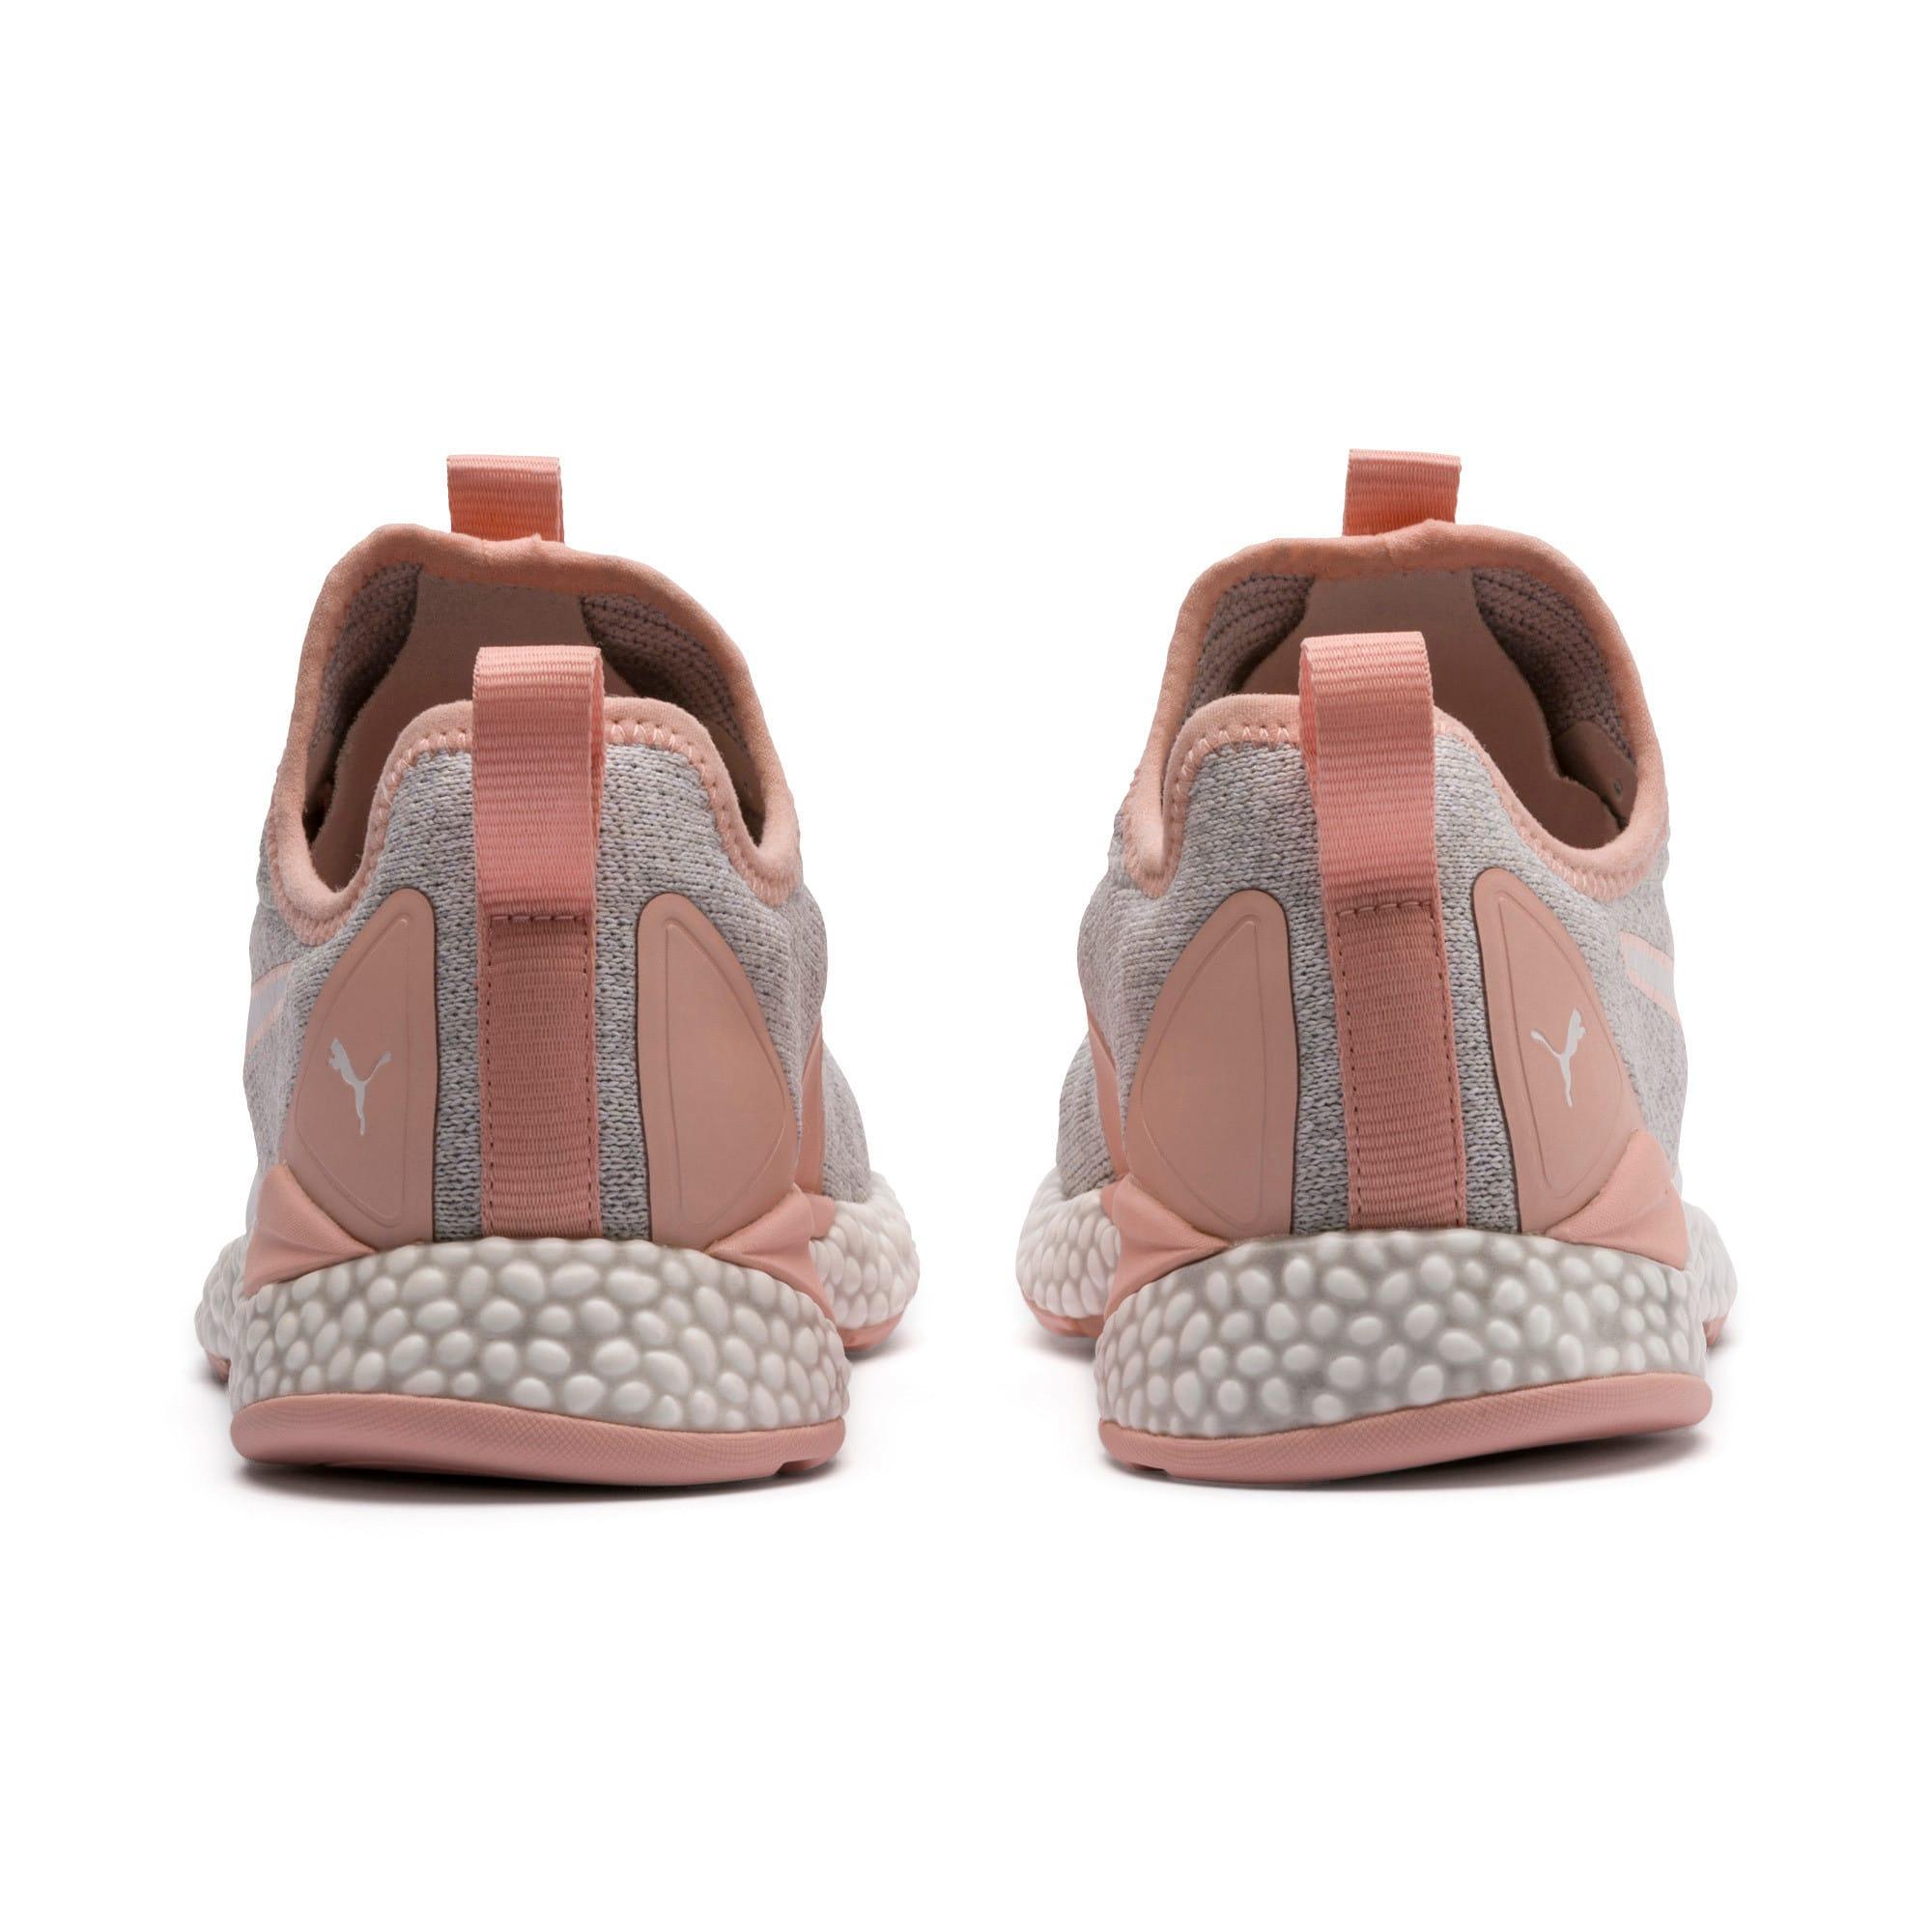 Thumbnail 4 of HYBRID Runner Women's Running Shoes, Glacier Gray-Peach Bud, medium